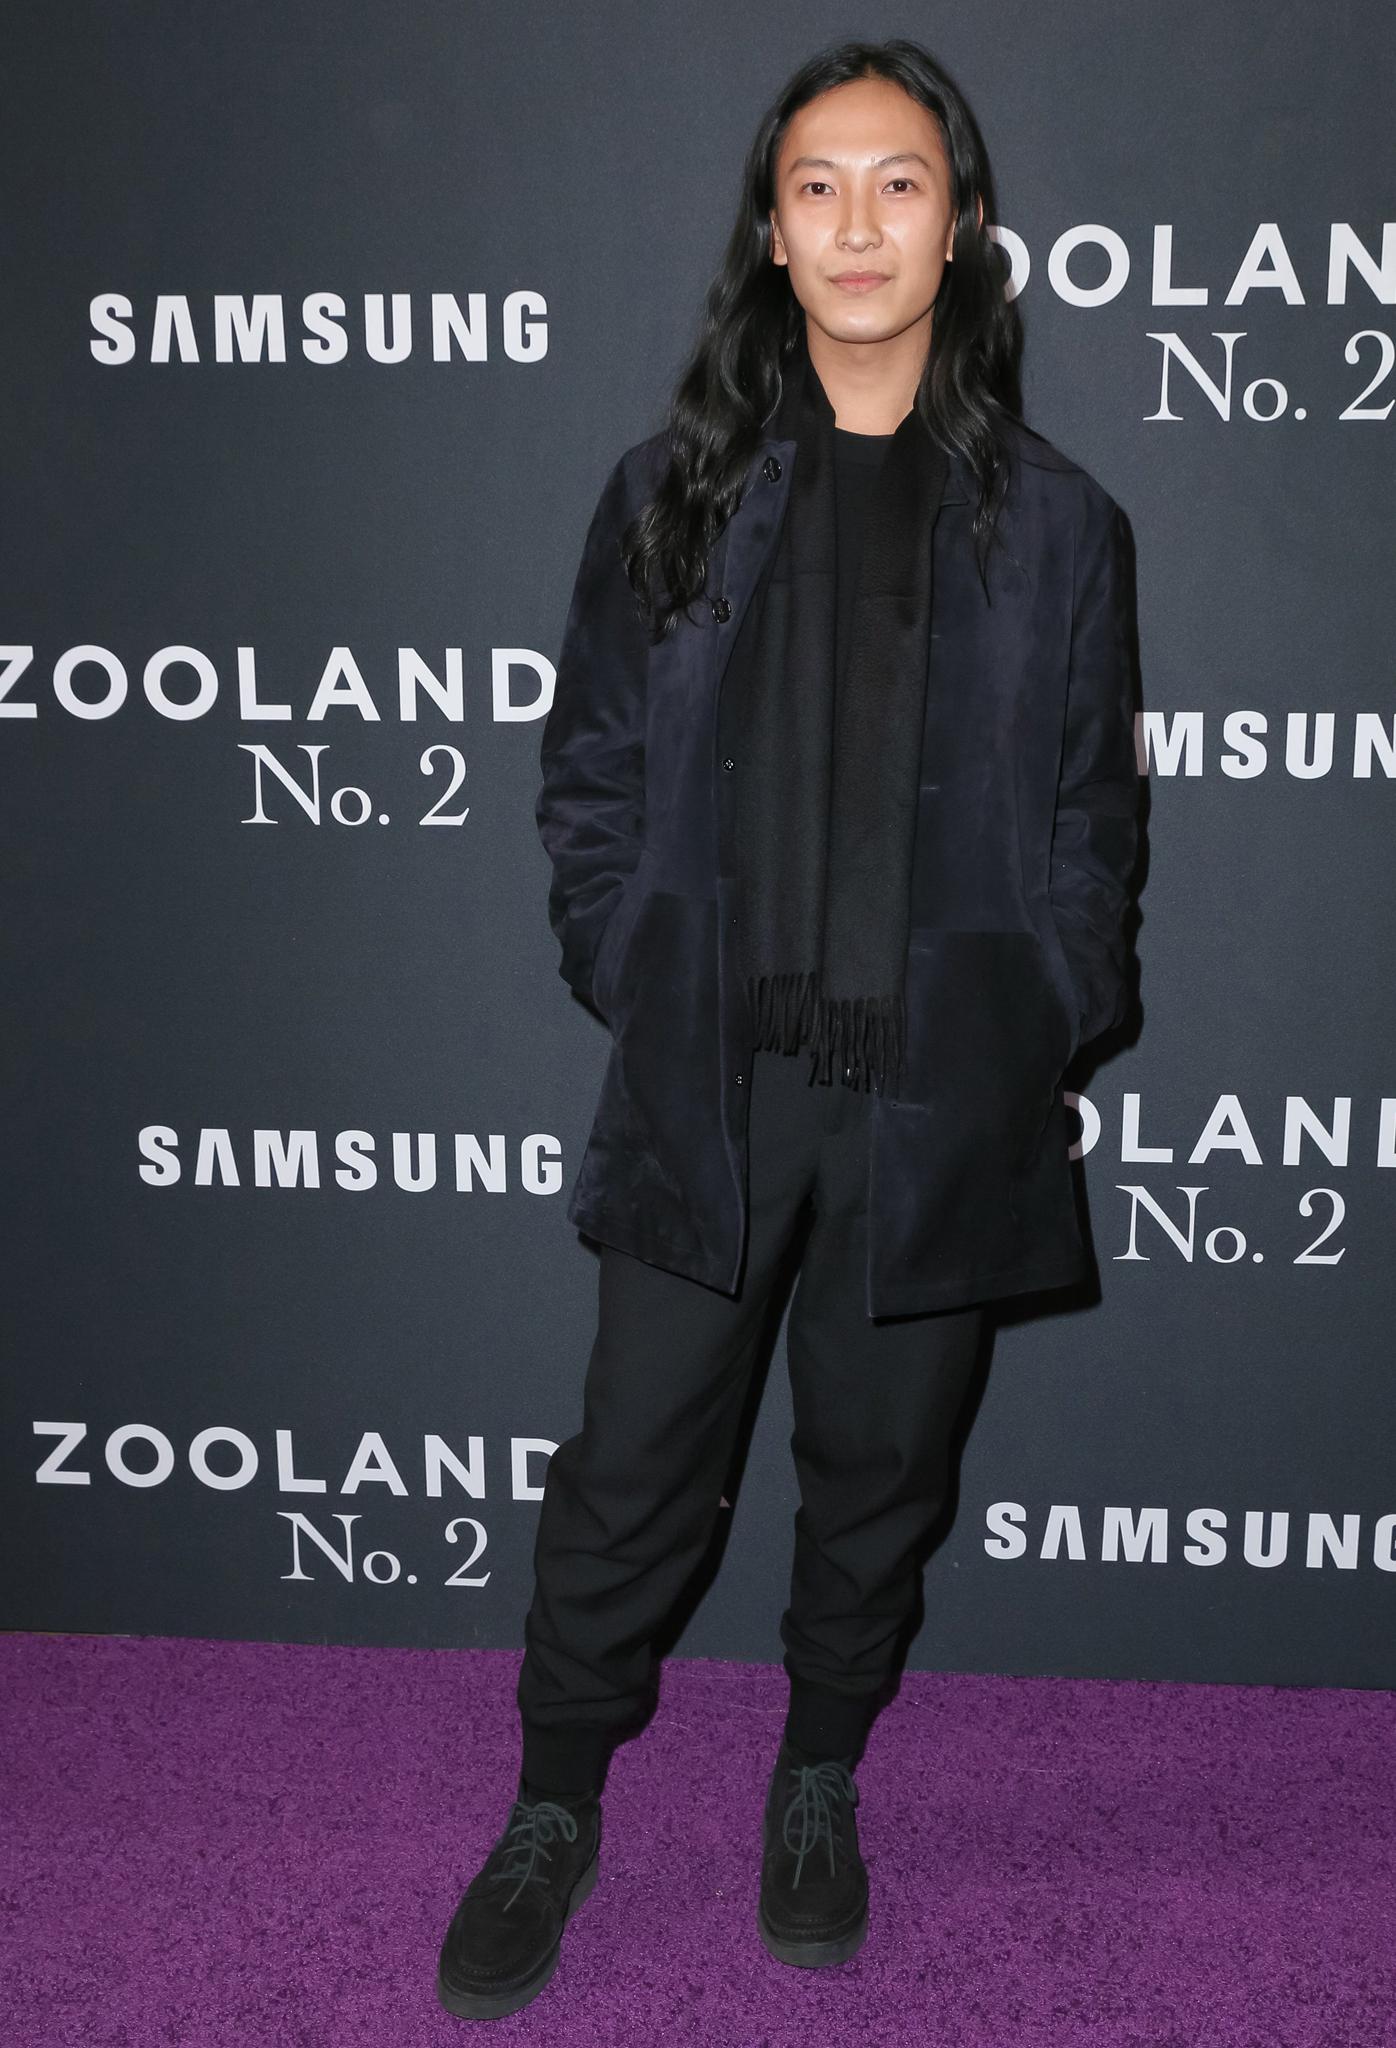 Alexander Wang at 'Zoolander No.2' film premiere, New York, America - 09 Feb 2016